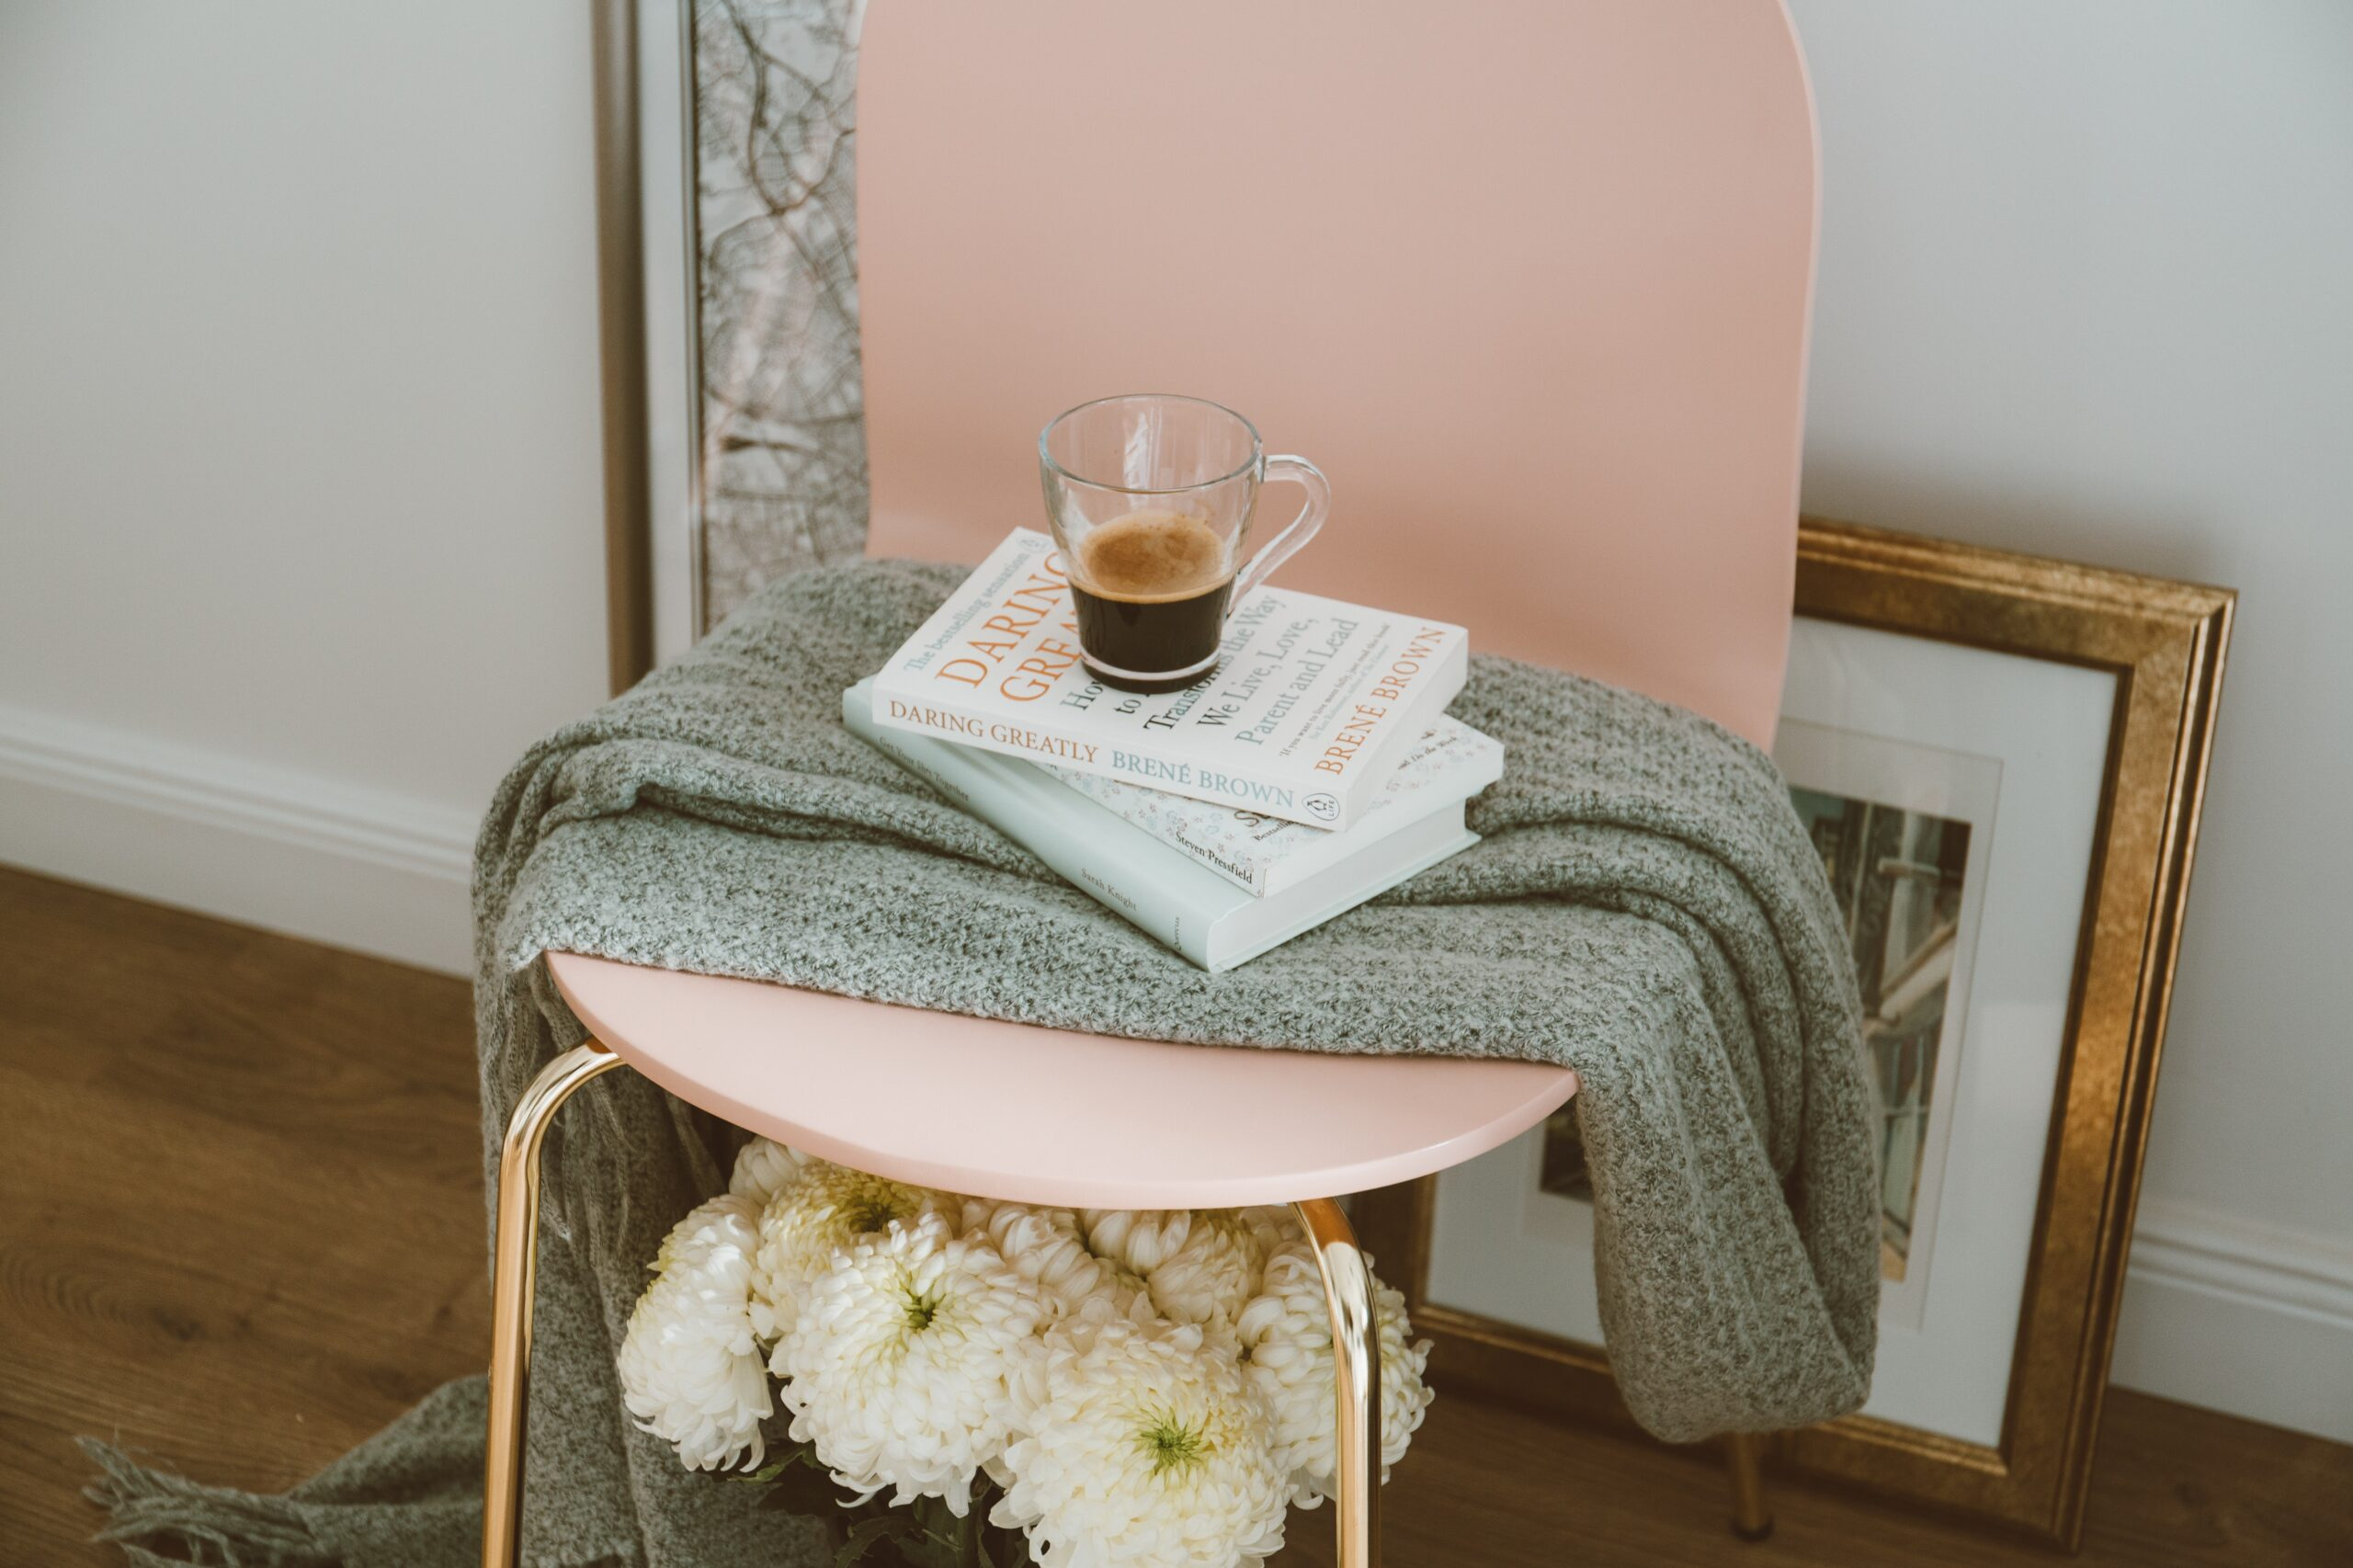 kaffe, böcker